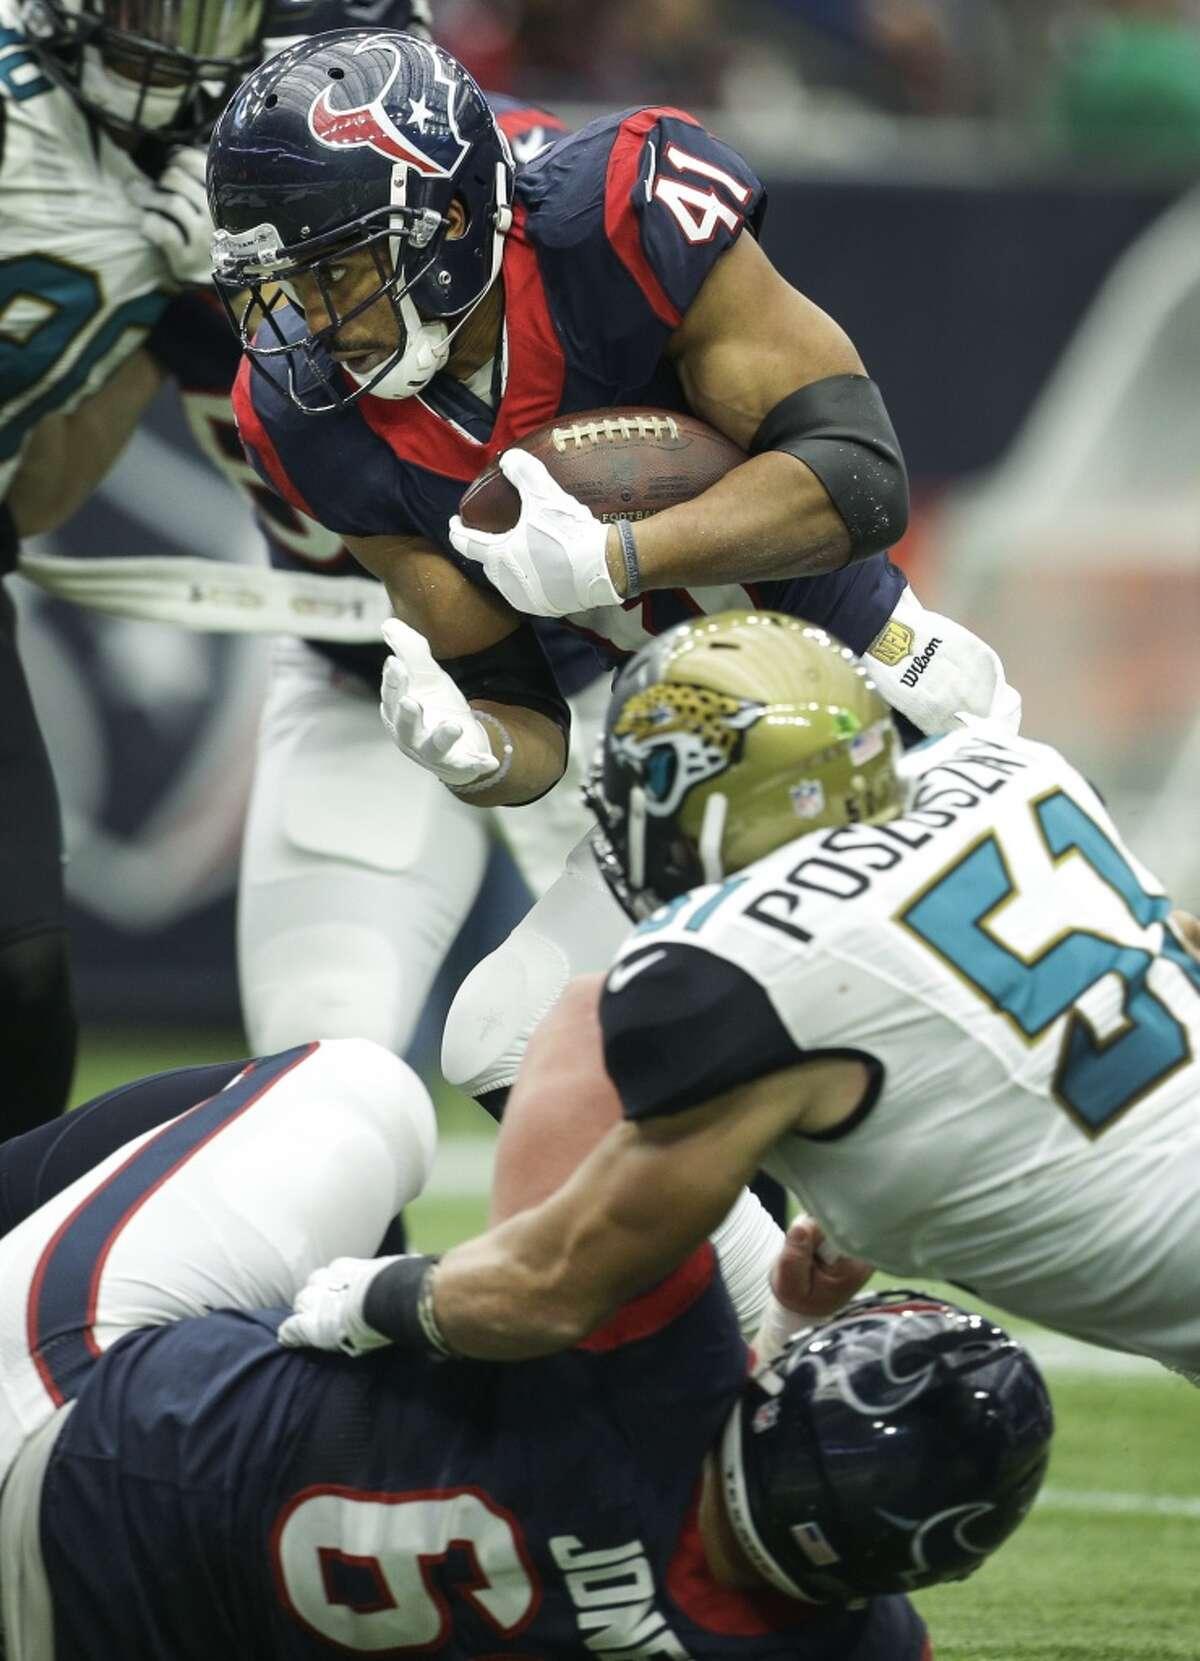 Houston Texans running back Jonathan Grimes (41) runs past Jacksonville Jaguars middle linebacker Paul Posluszny (51) for a 3-yard touchdown run during the second quarter of an NFL football game at NRG Stadium on Sunday, Jan. 3, 2016, in Houston. ( Brett Coomer / Houston Chronicle )